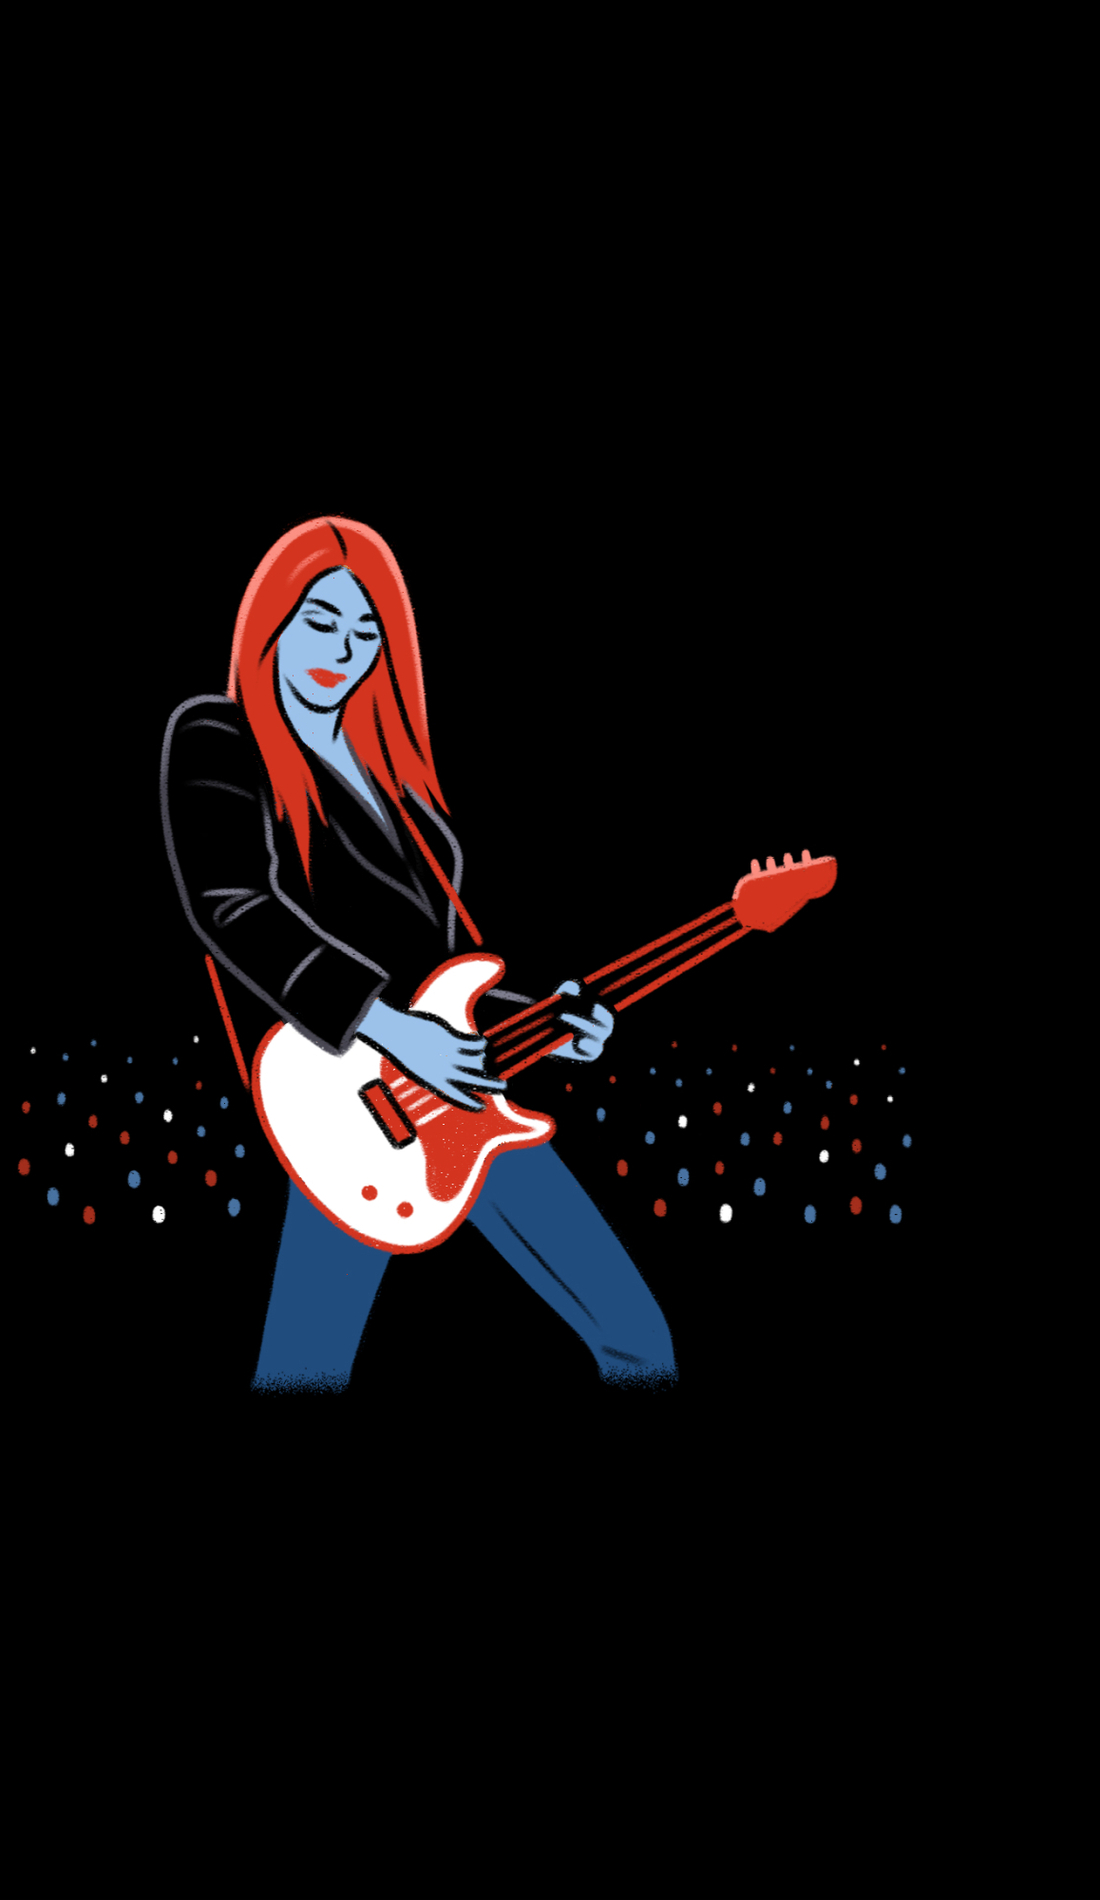 A Soda Stereo live event